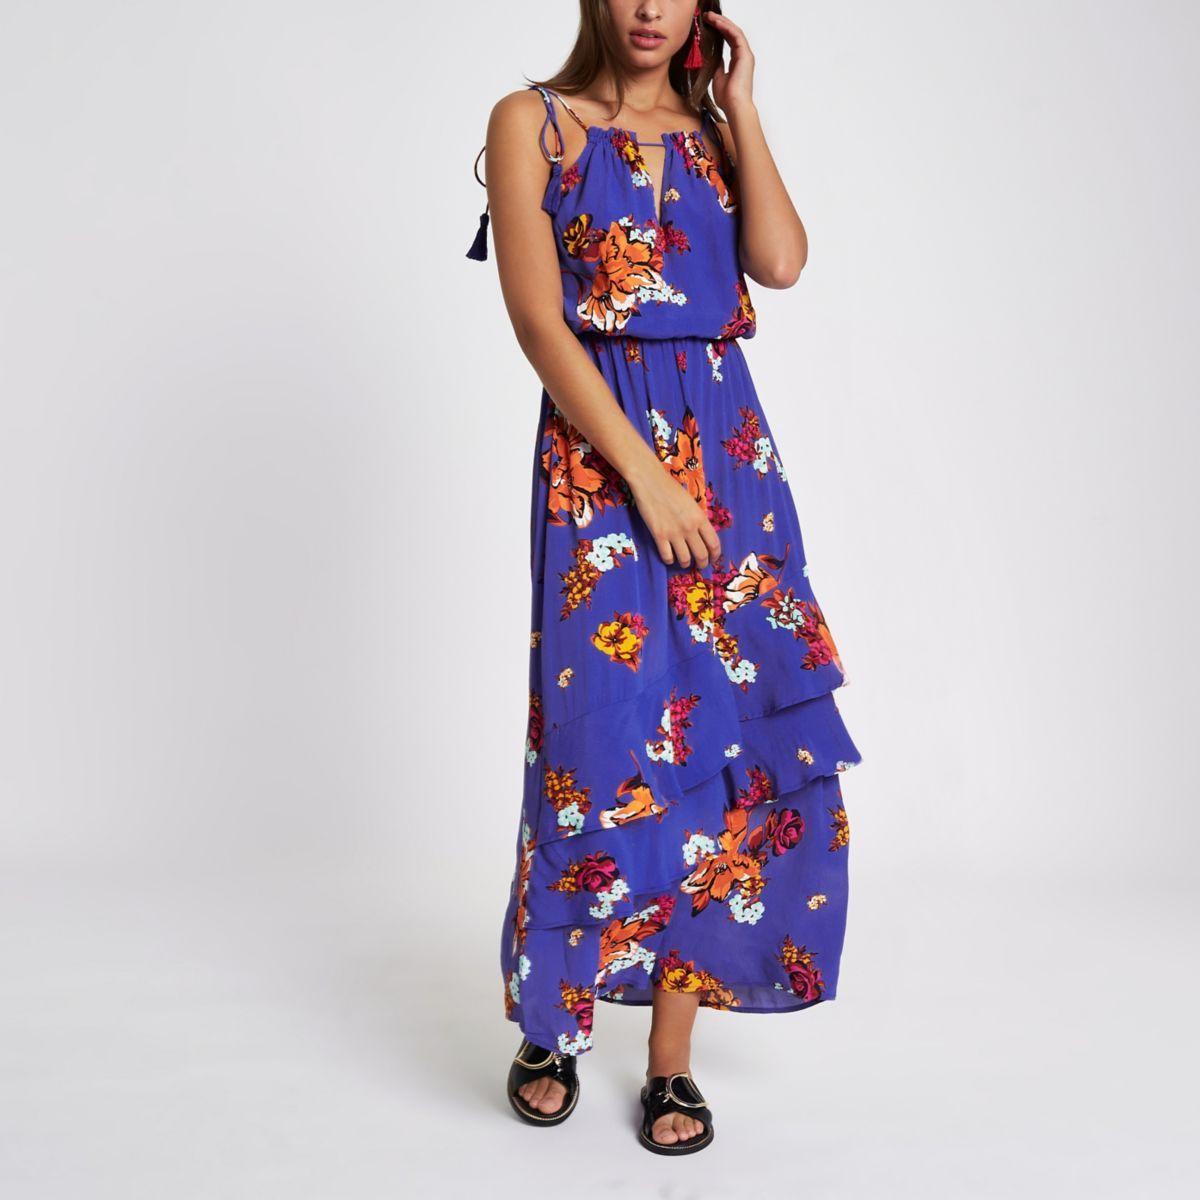 d87634c5a909 Blue floral print tassel high neck maxi dress